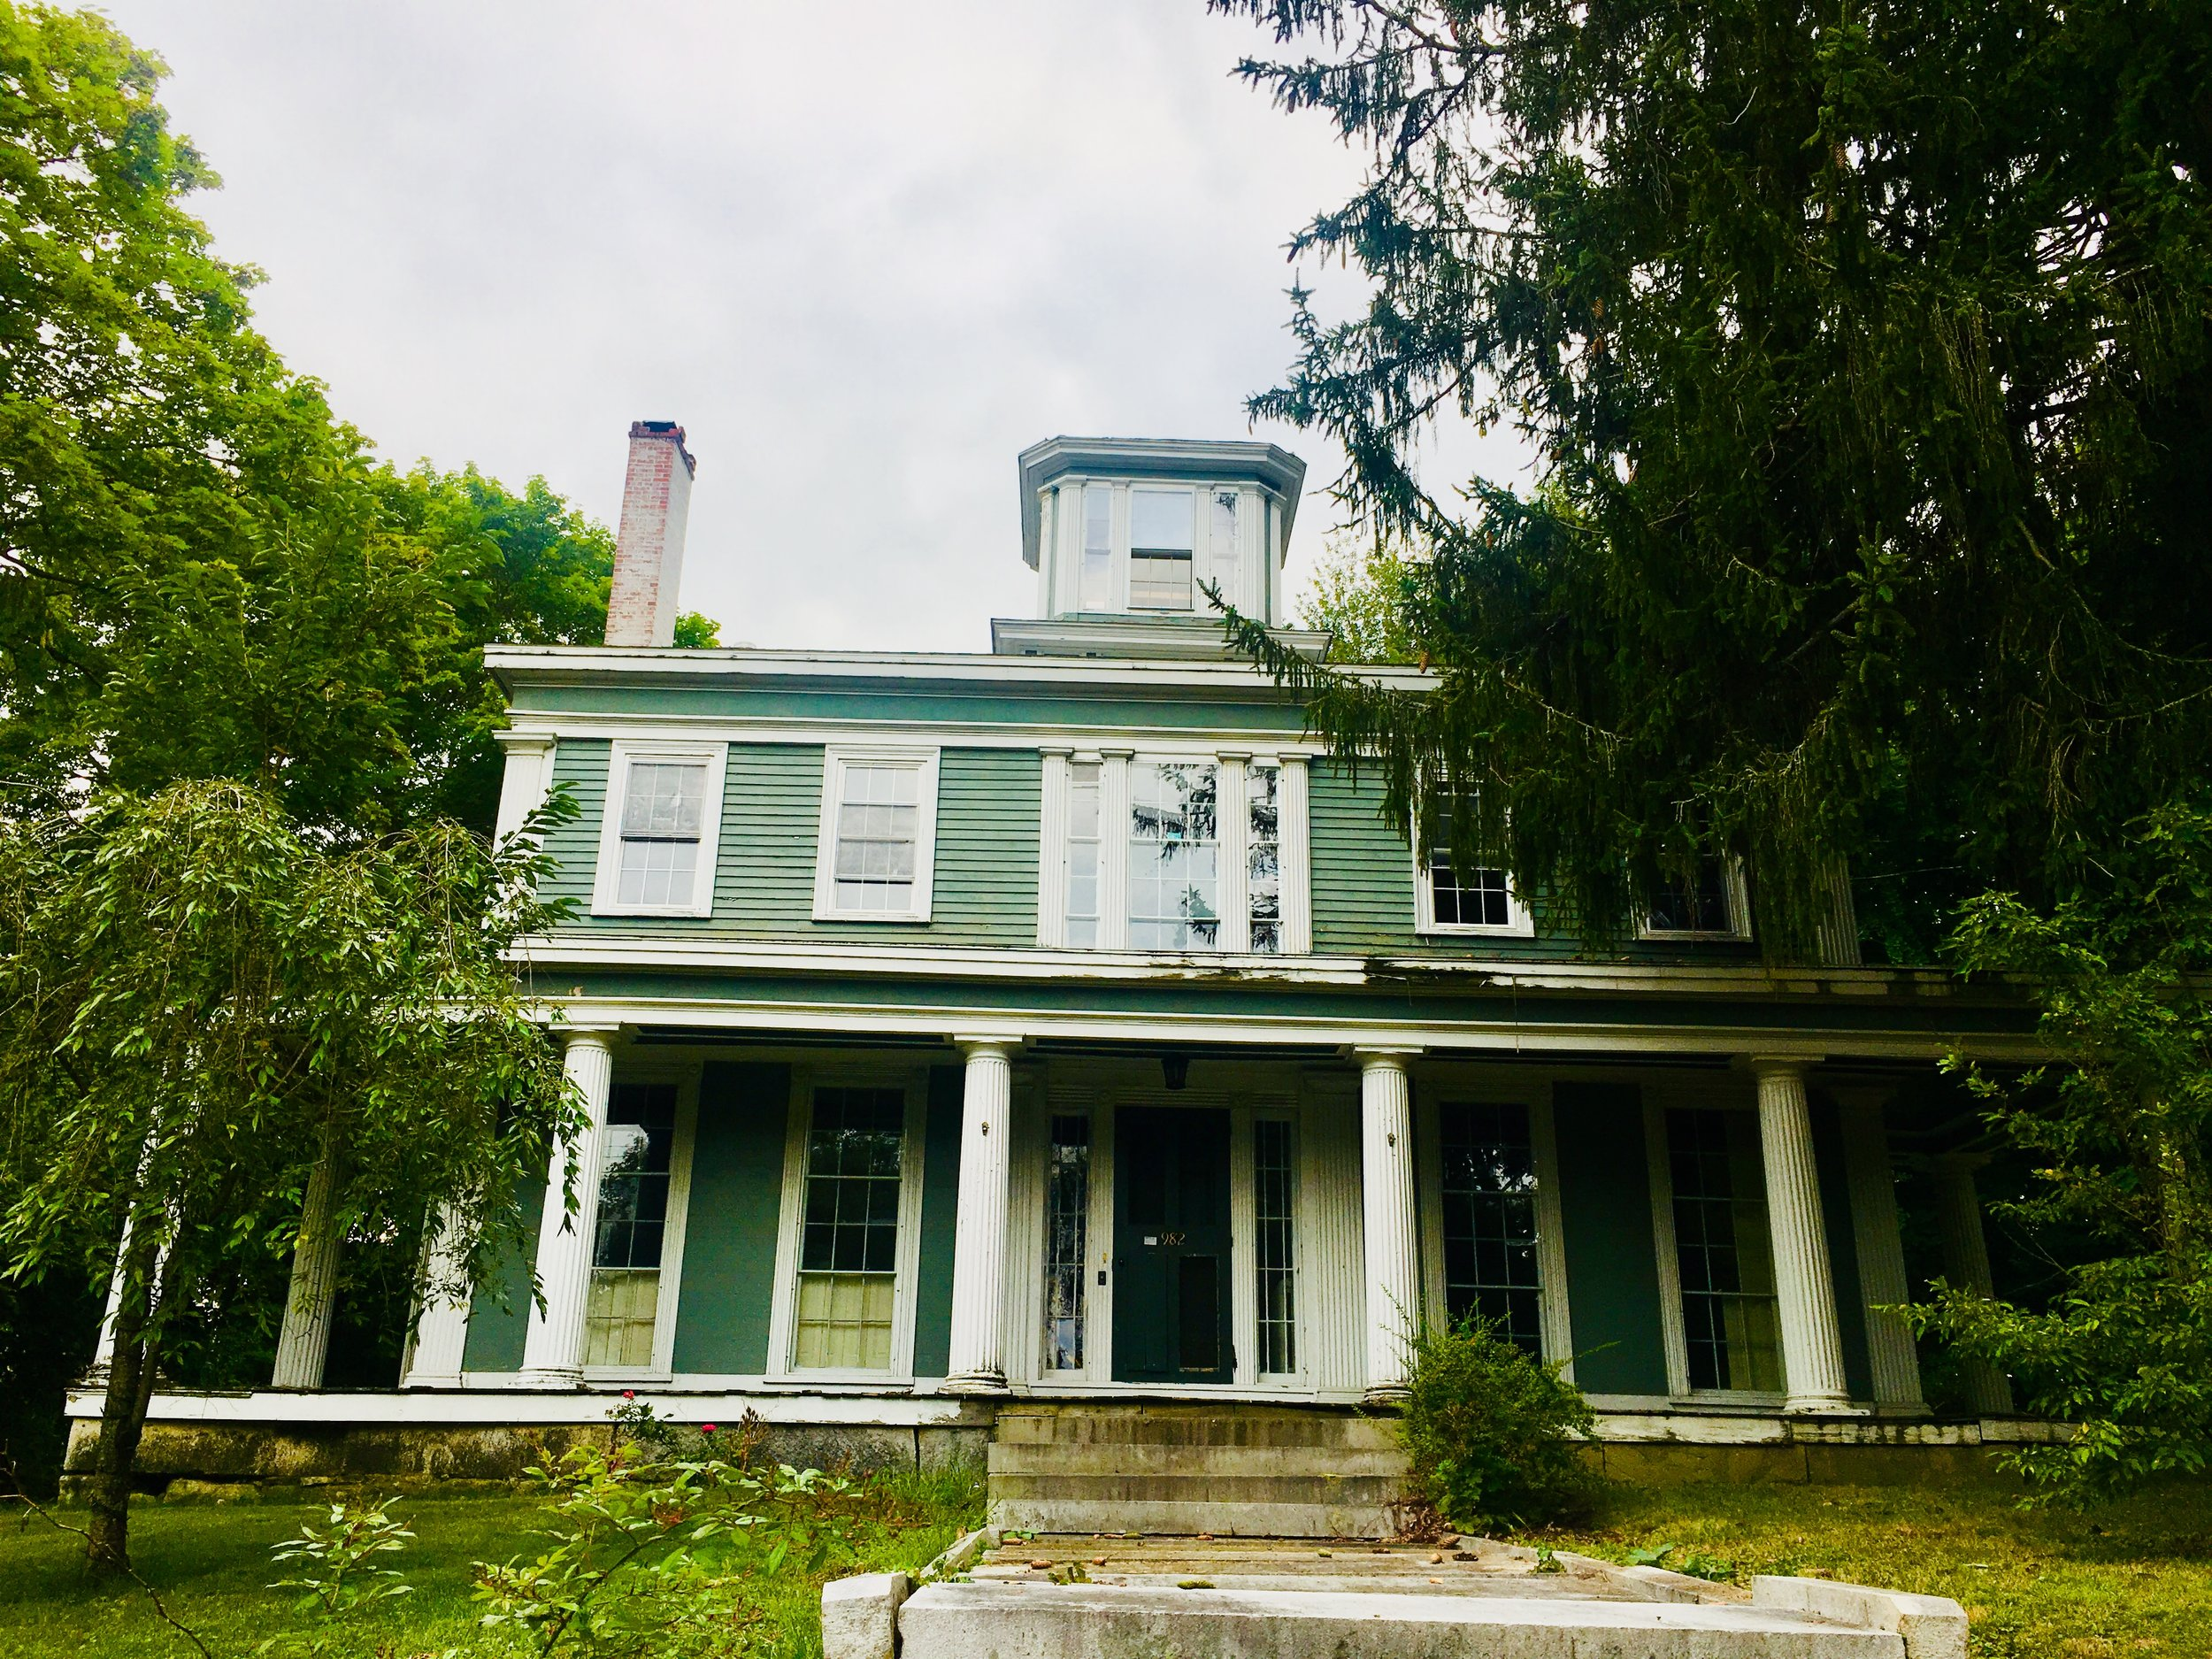 5_tallman house.jpg